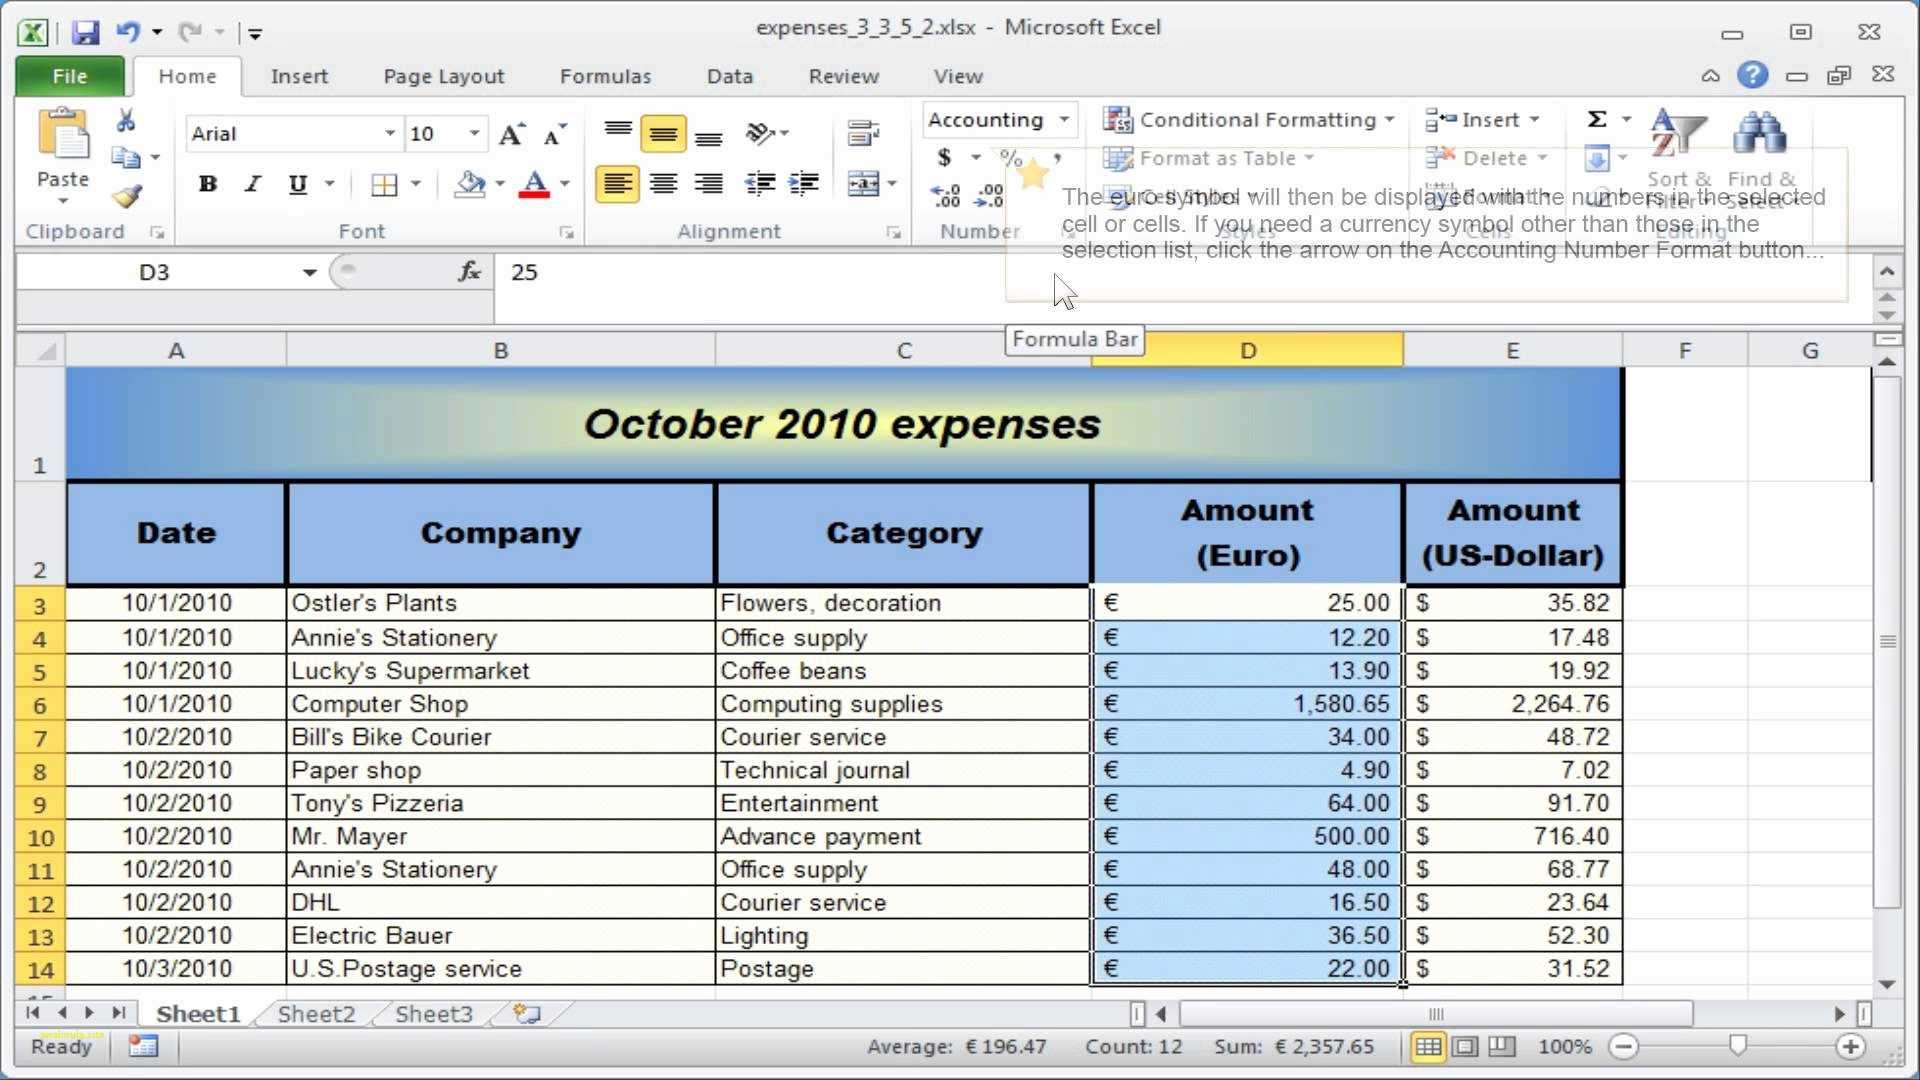 Rental Property Excel Spreadsheet   Awal Mula Inside Rental Property Accounting Spreadsheet